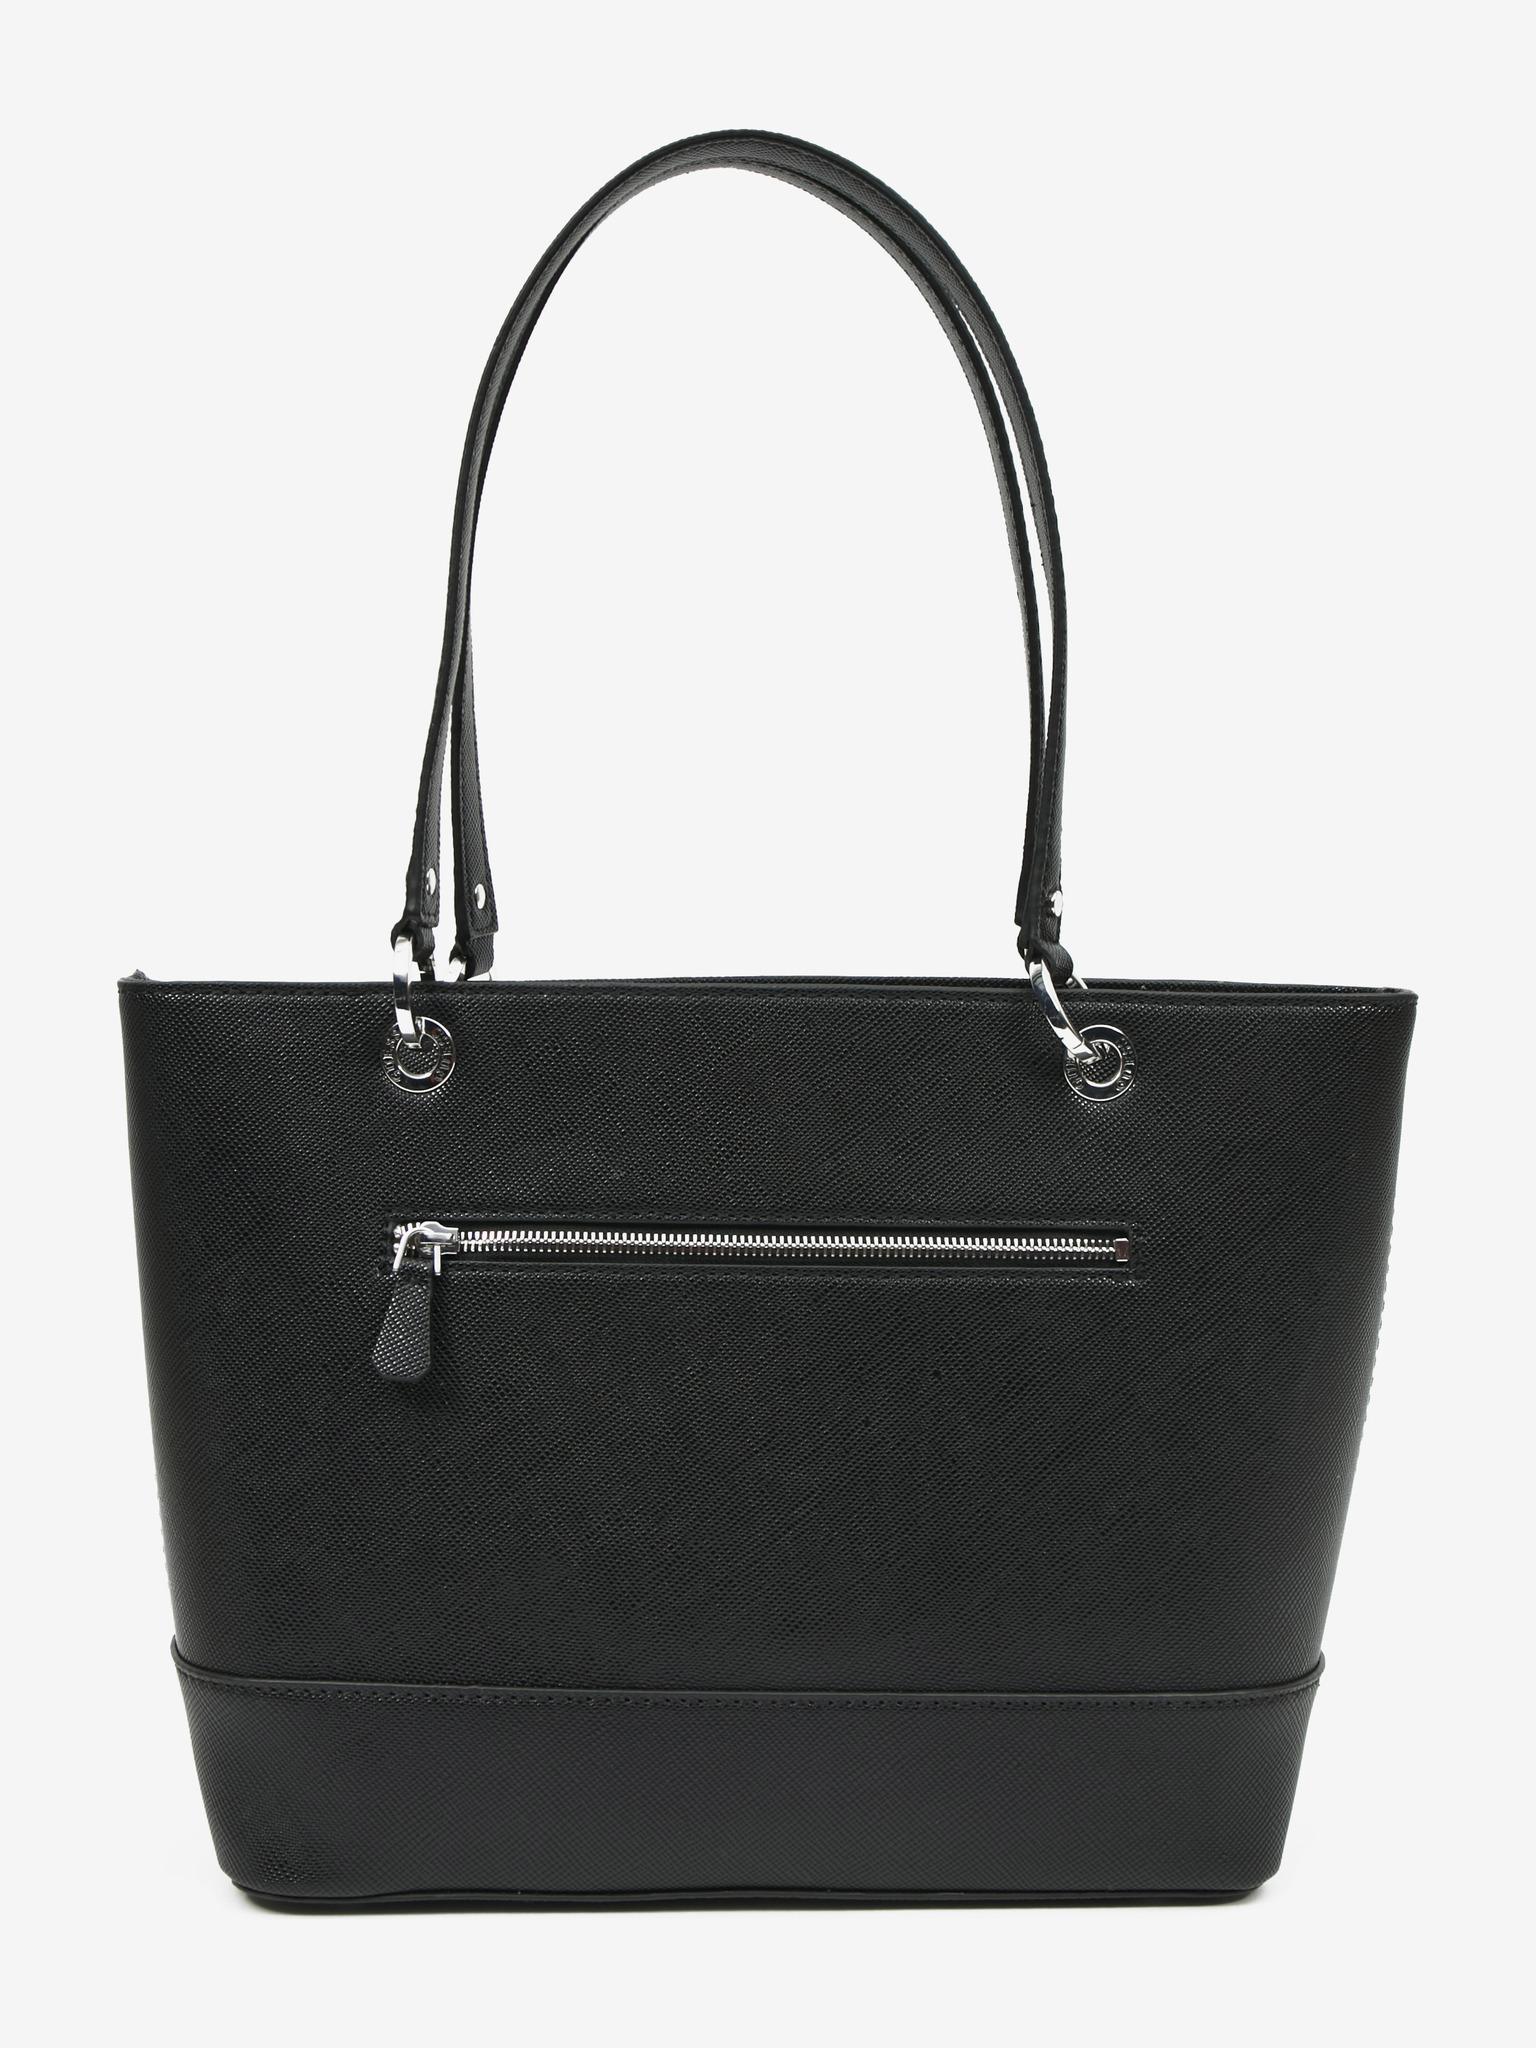 Guess black handbag Noelle Elite